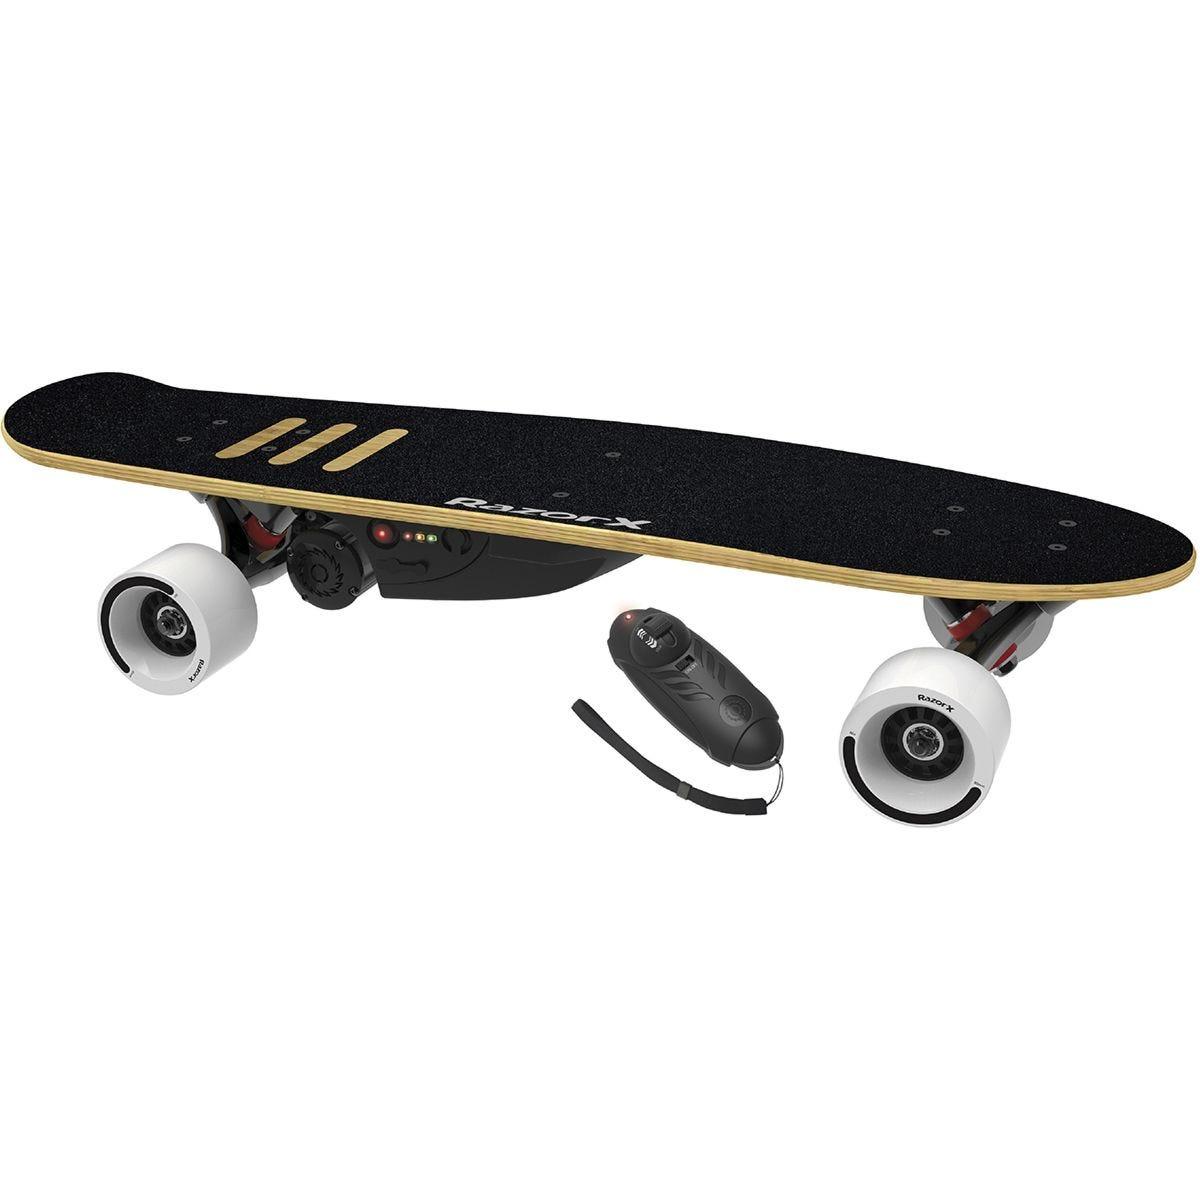 RazorX Cruiser Lithium Battery Powered Electric Skateboard